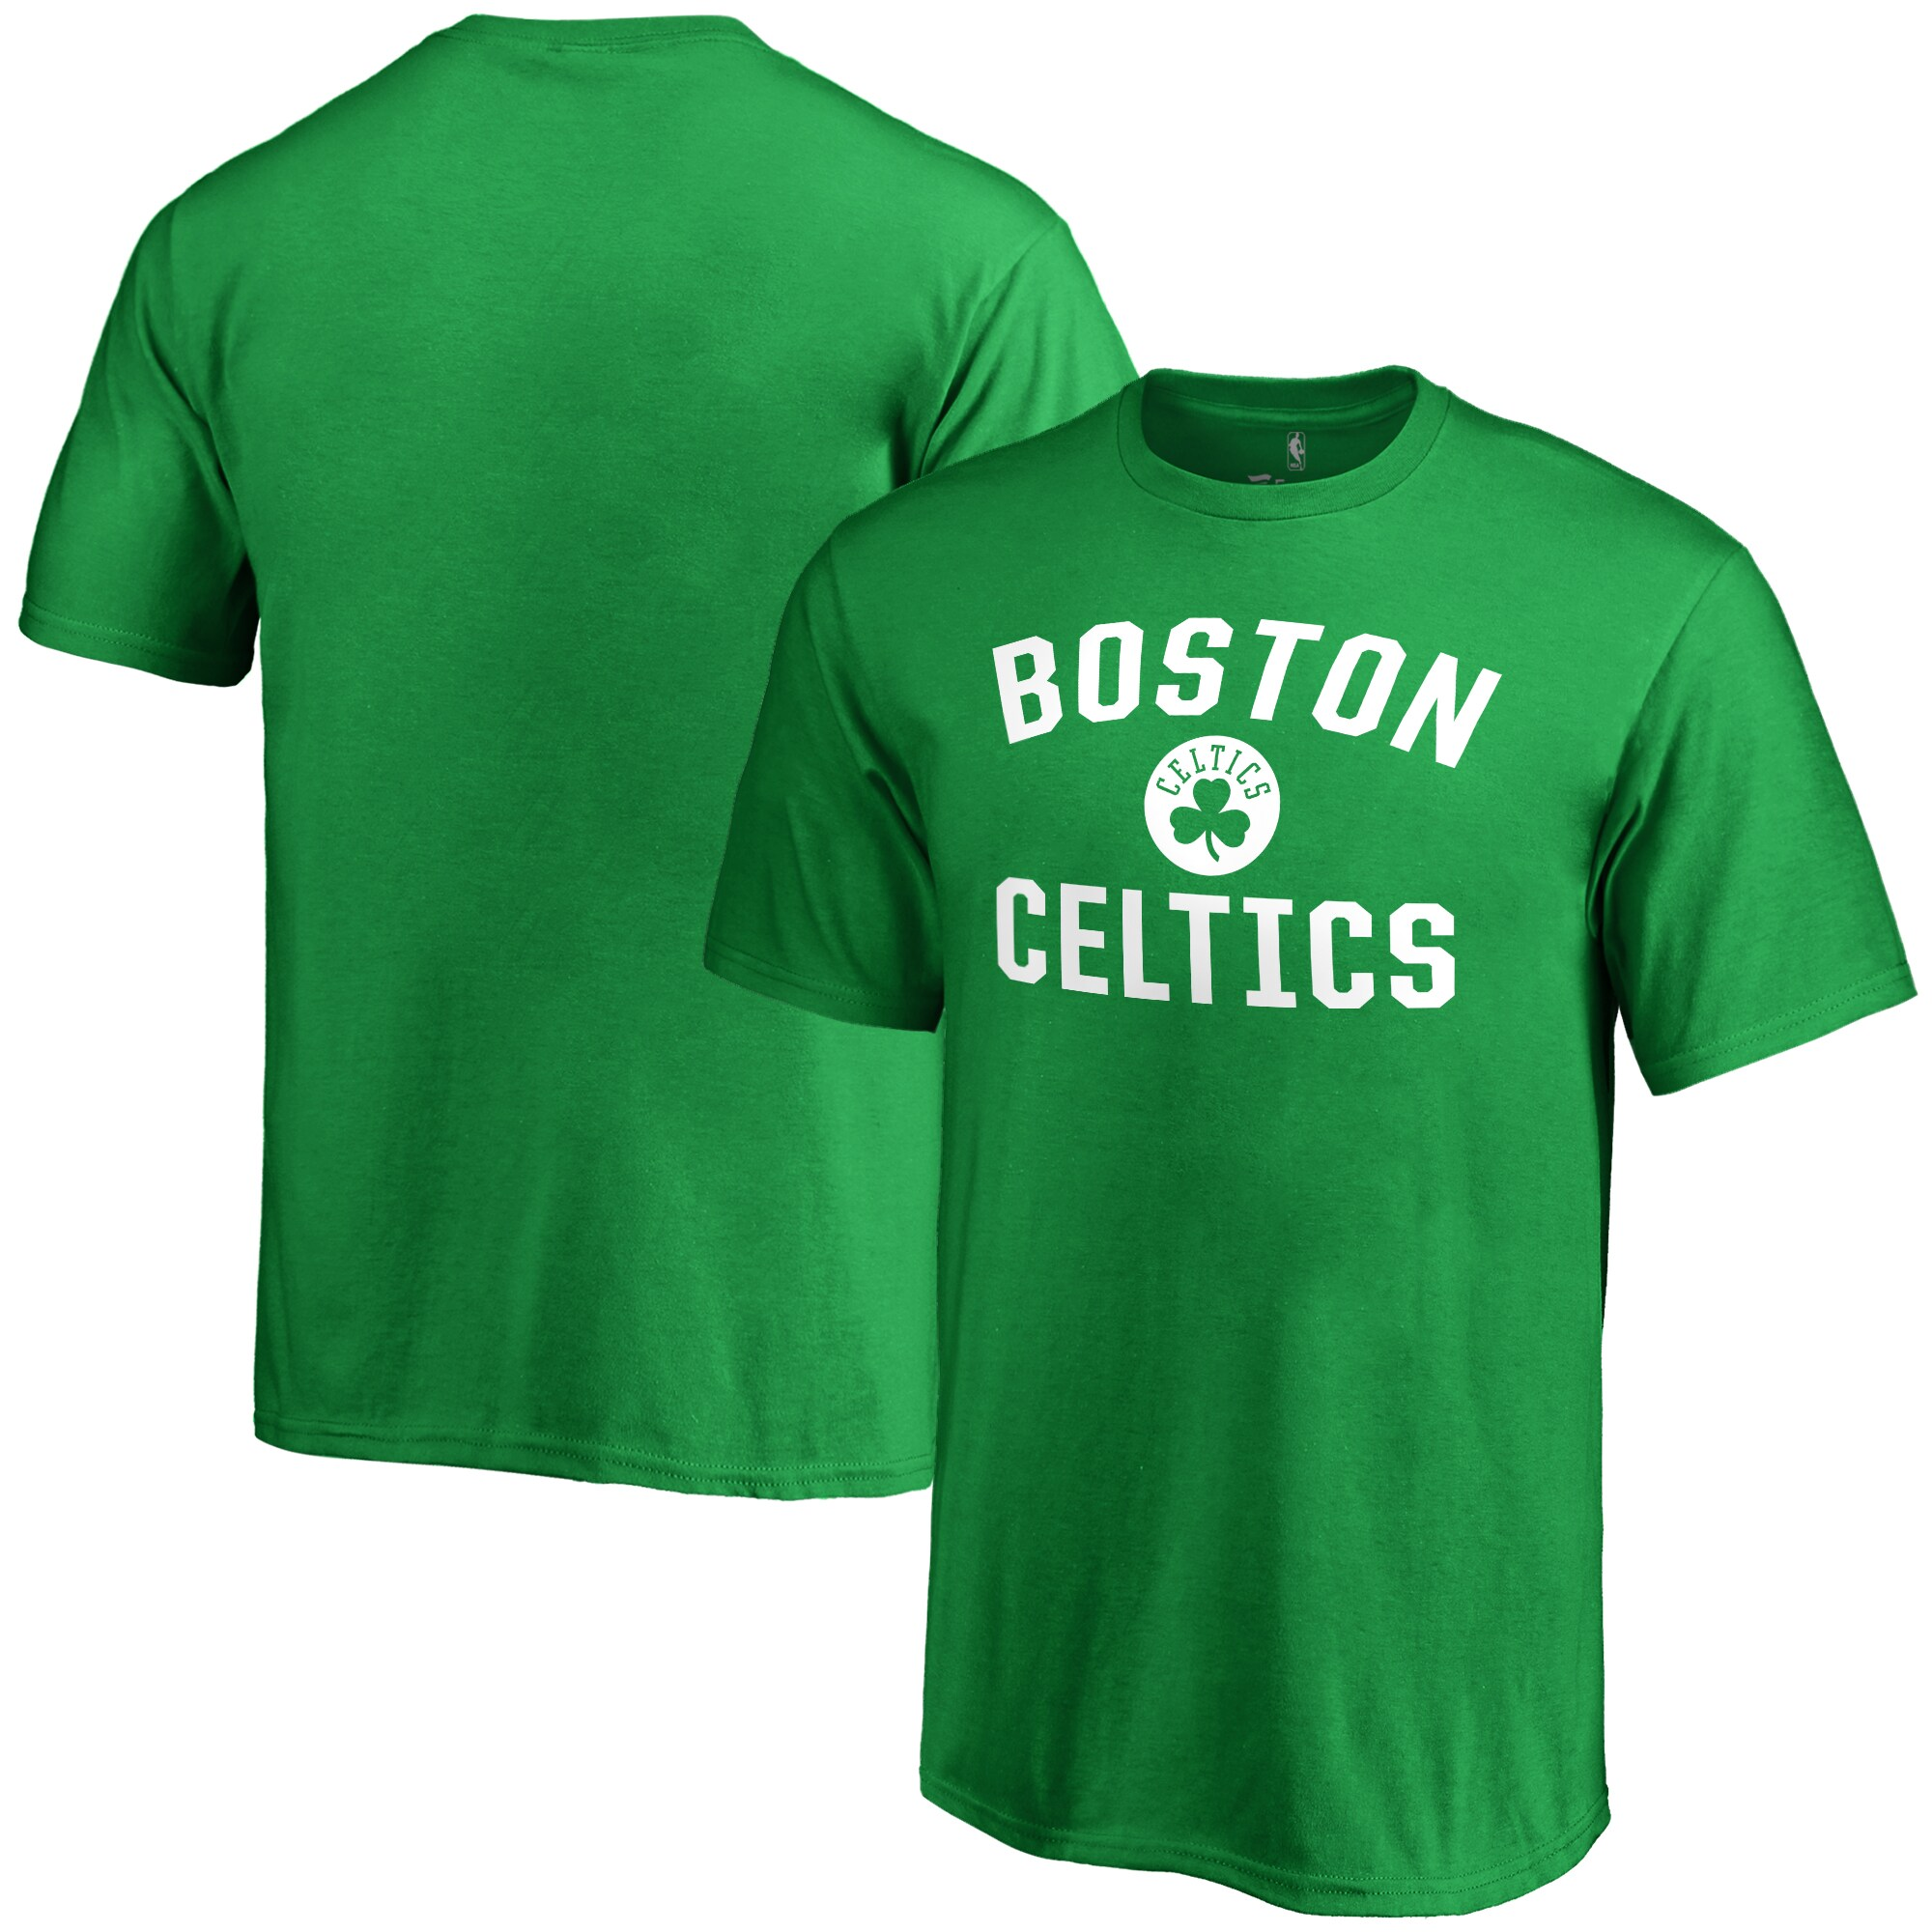 Boston Celtics Youth Victory Arch T-Shirt - Kelly Green